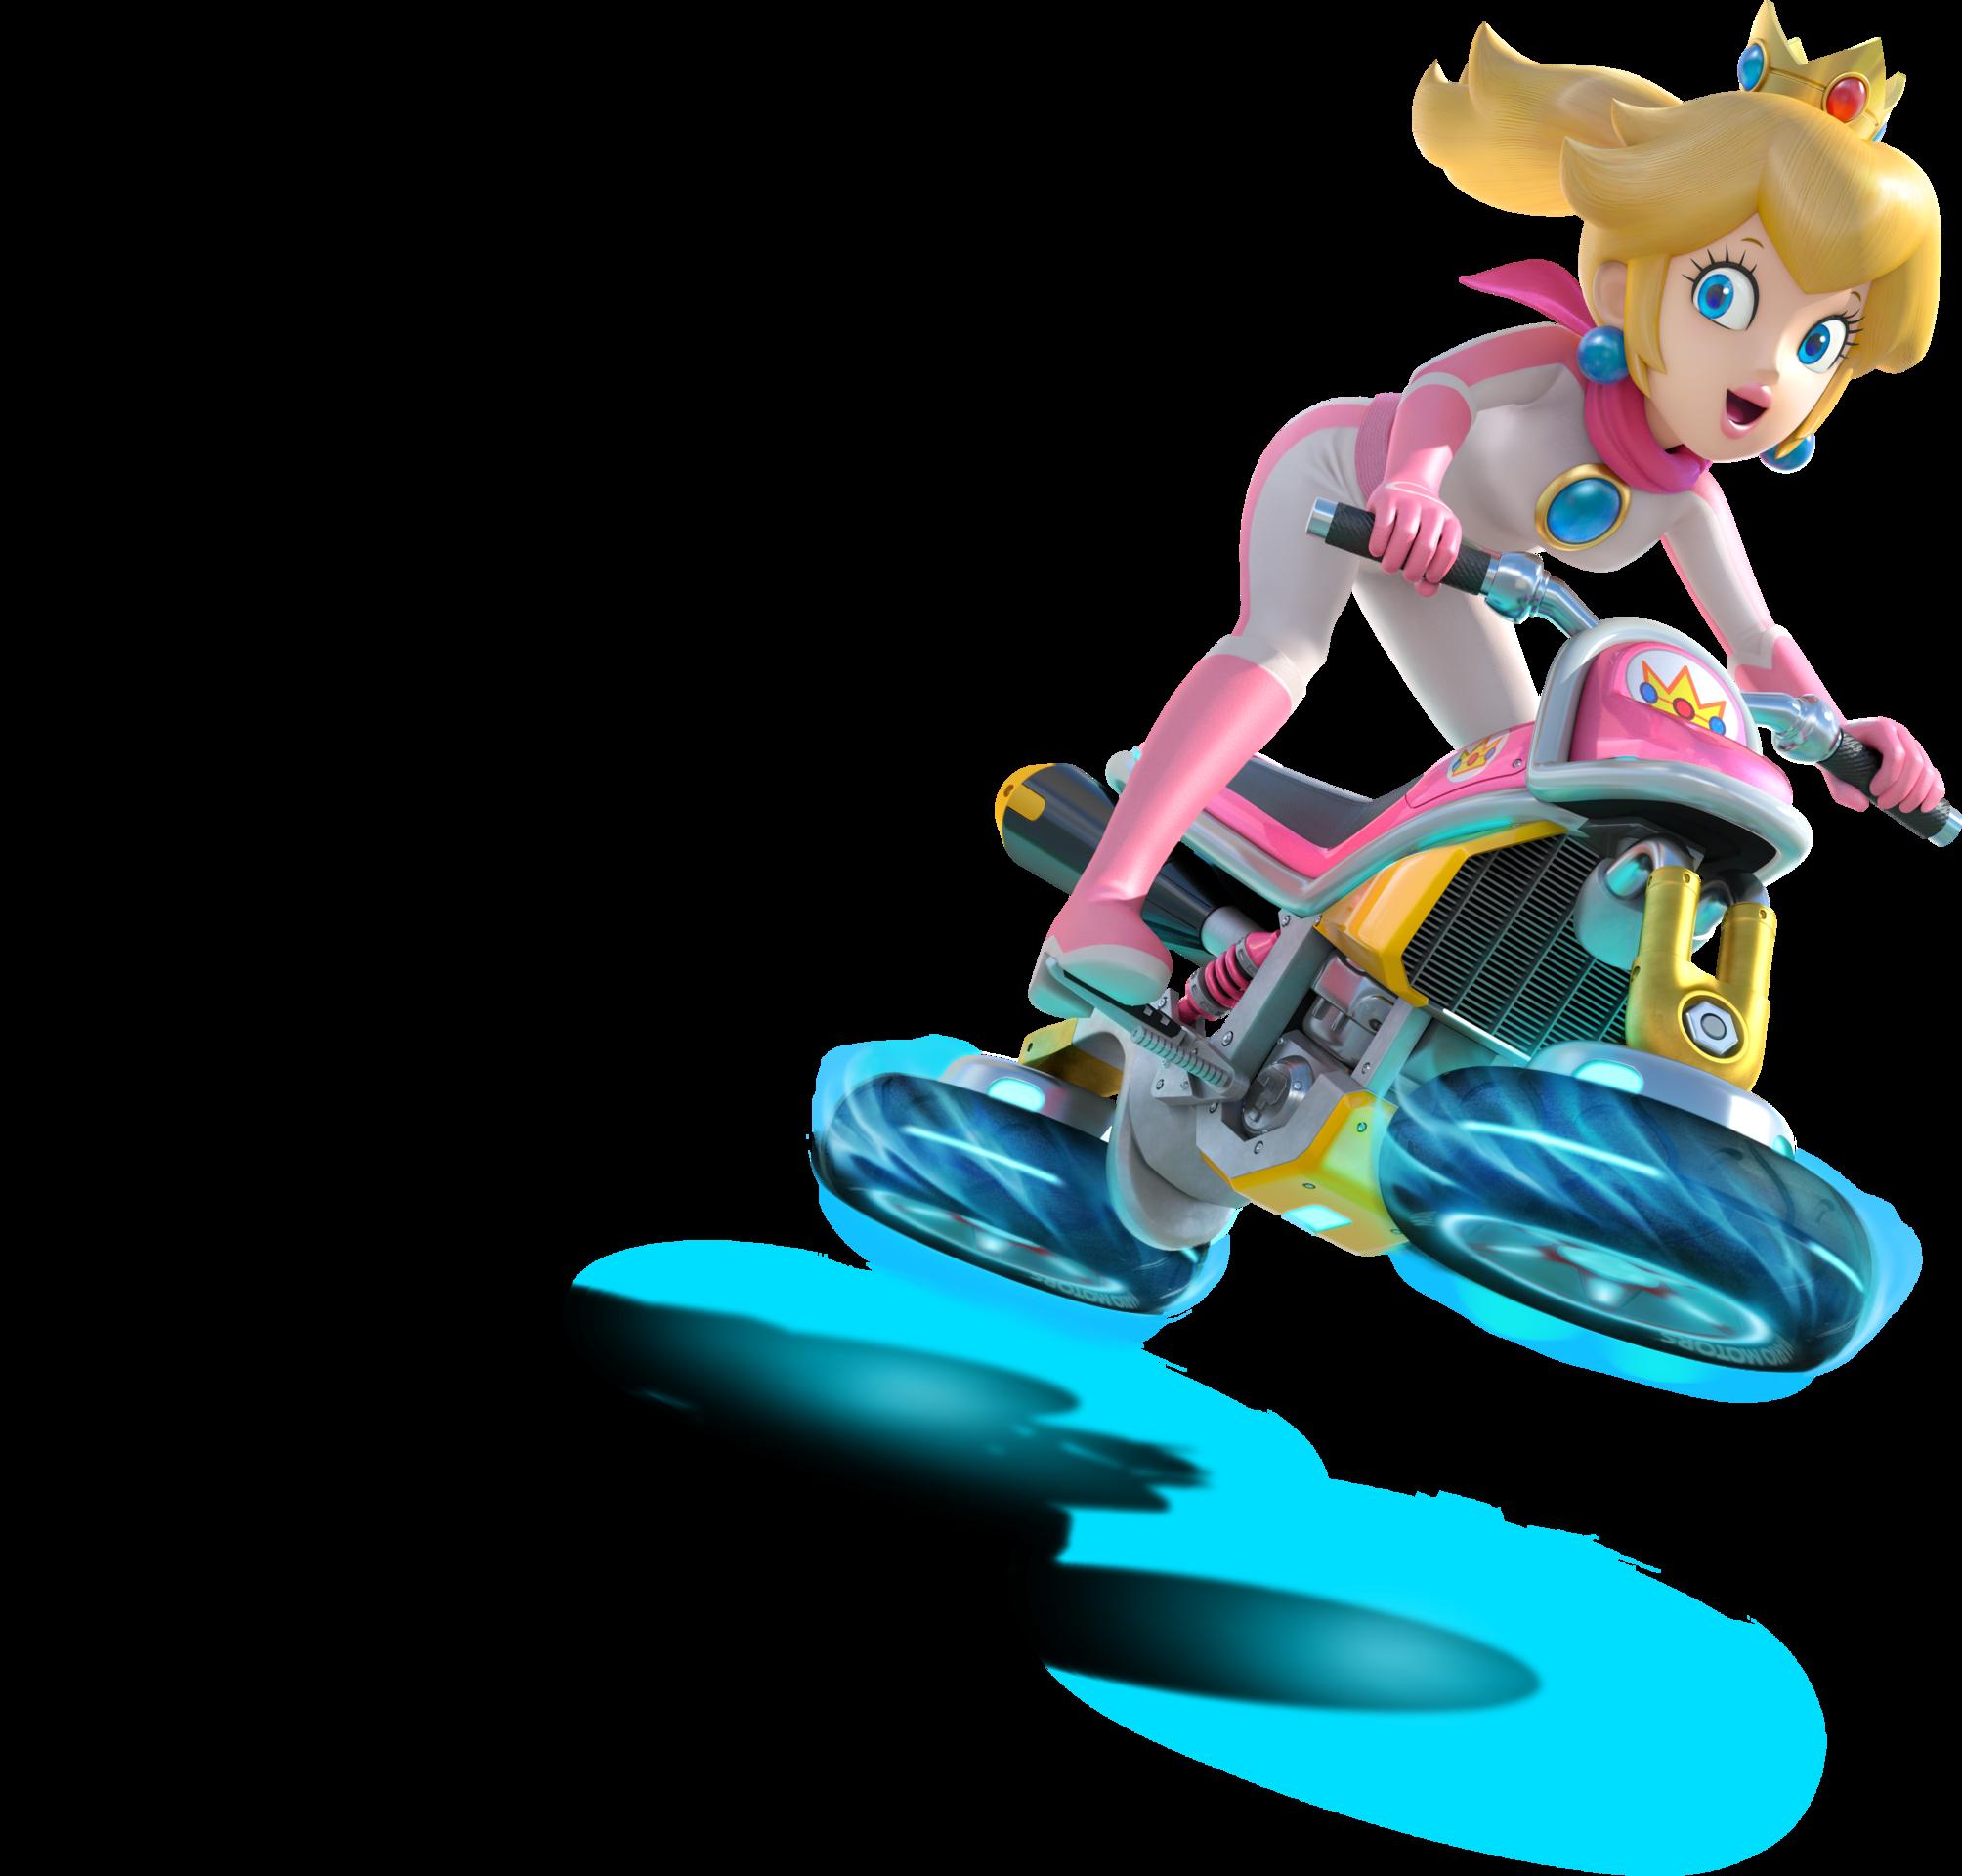 Princess Peach Mario Kart Racing Wiki Fandom